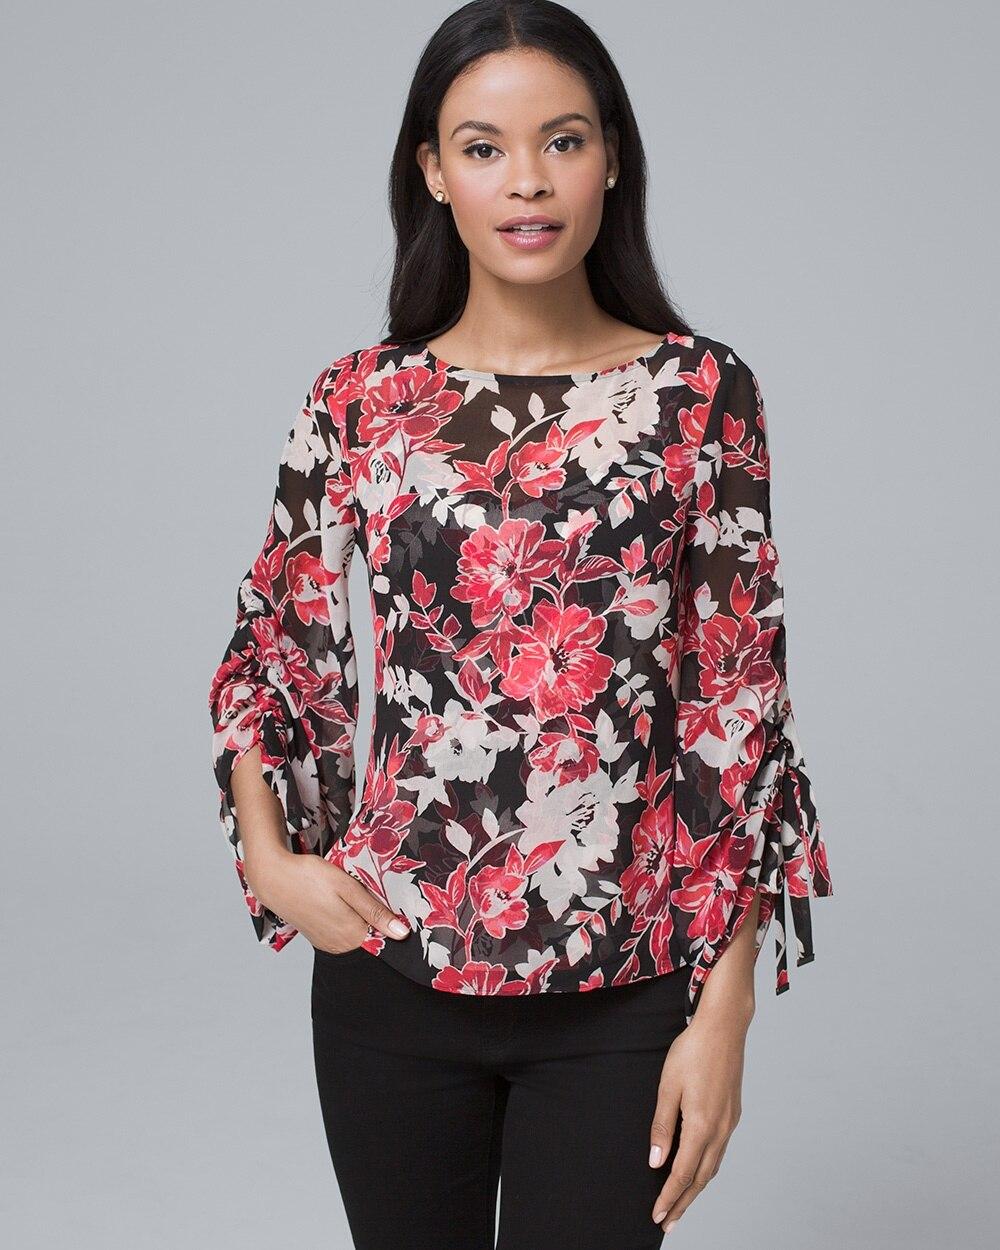 9da4140a00dac Tie-Sleeve Floral Blouse - White House Black Market